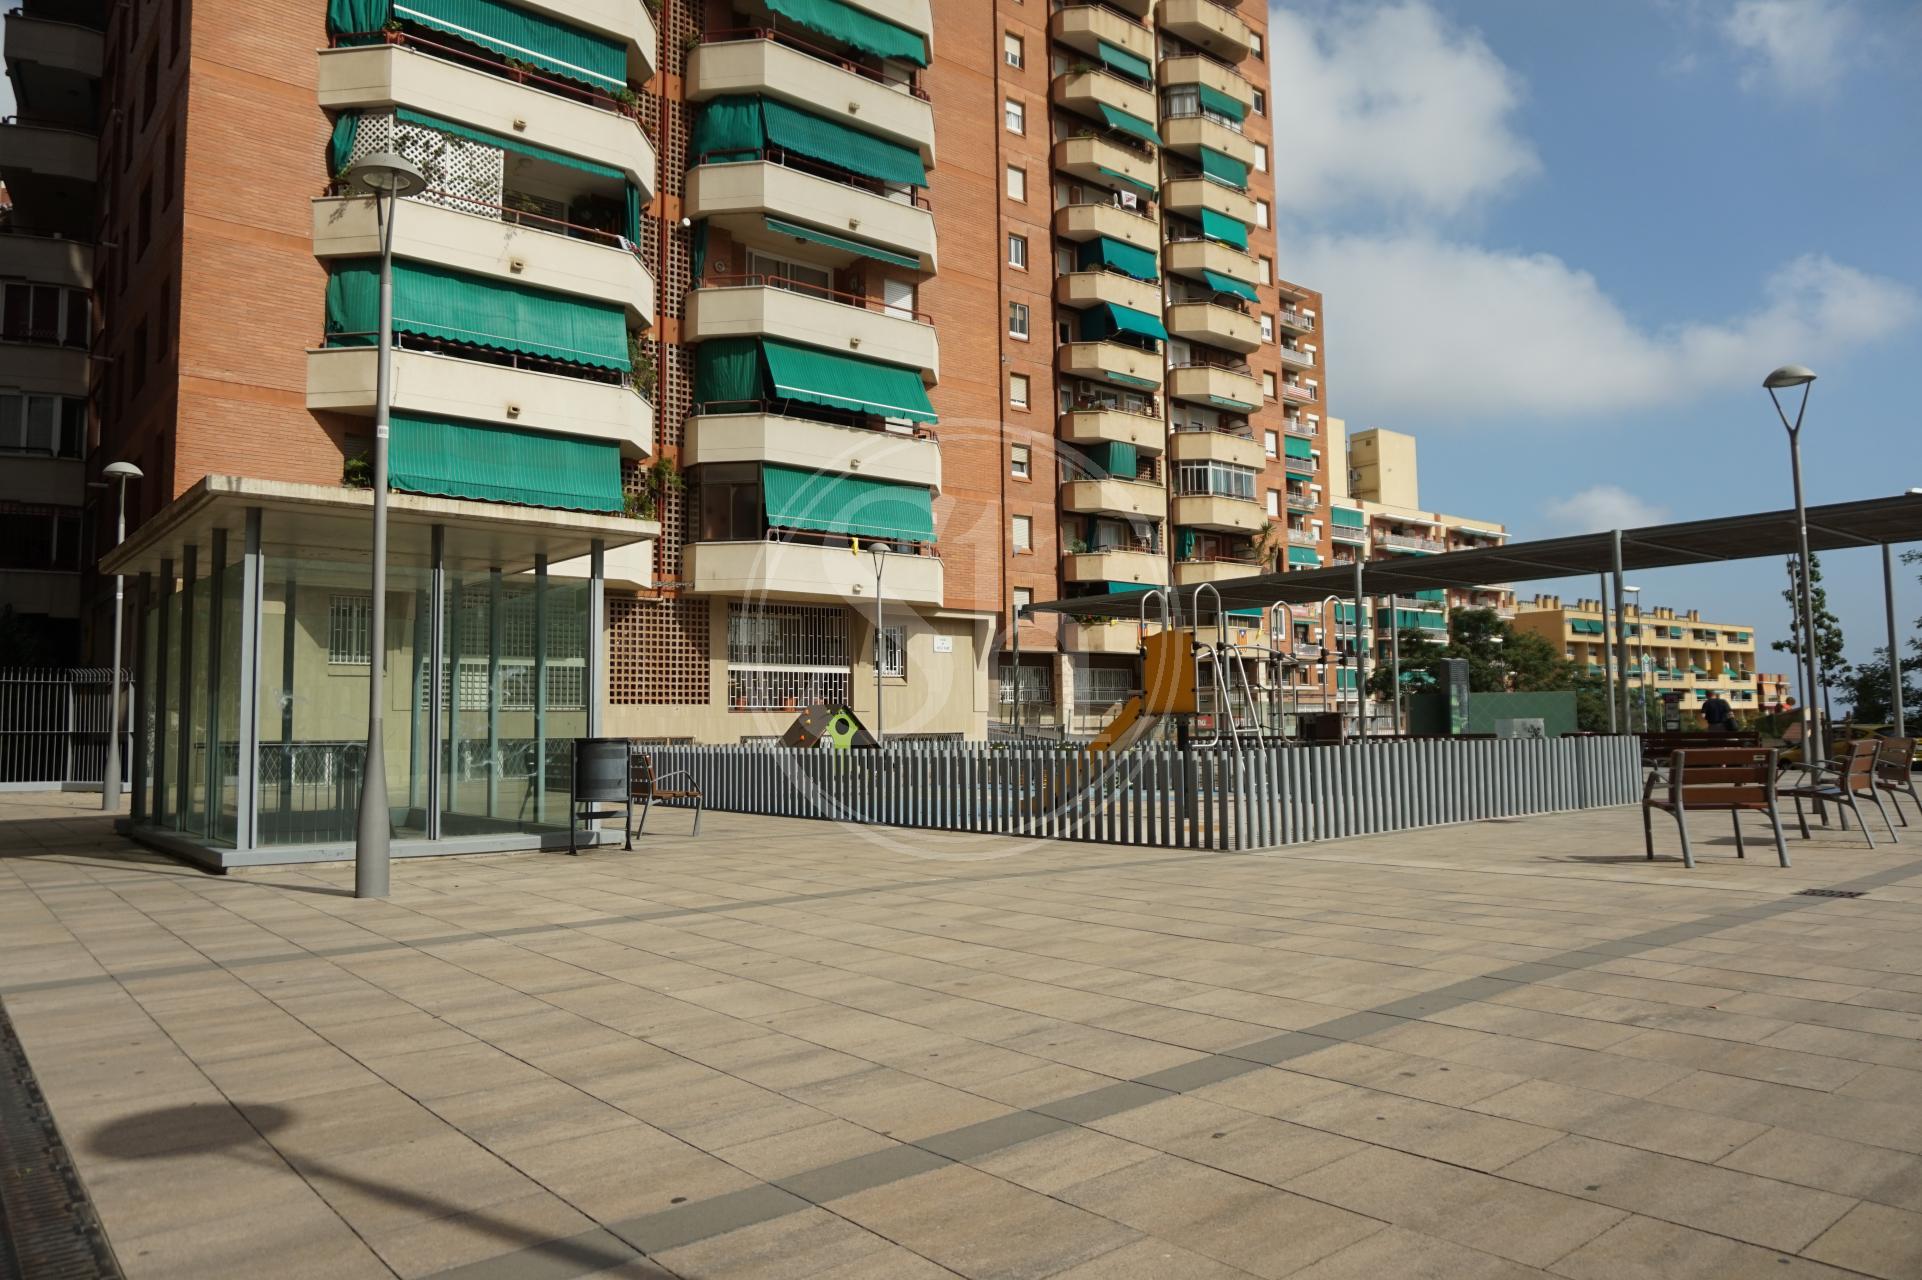 Pis en lloguer barcelona horta guinard albert llanas ctra del carmel - Lloguer pis barcelona particular ...